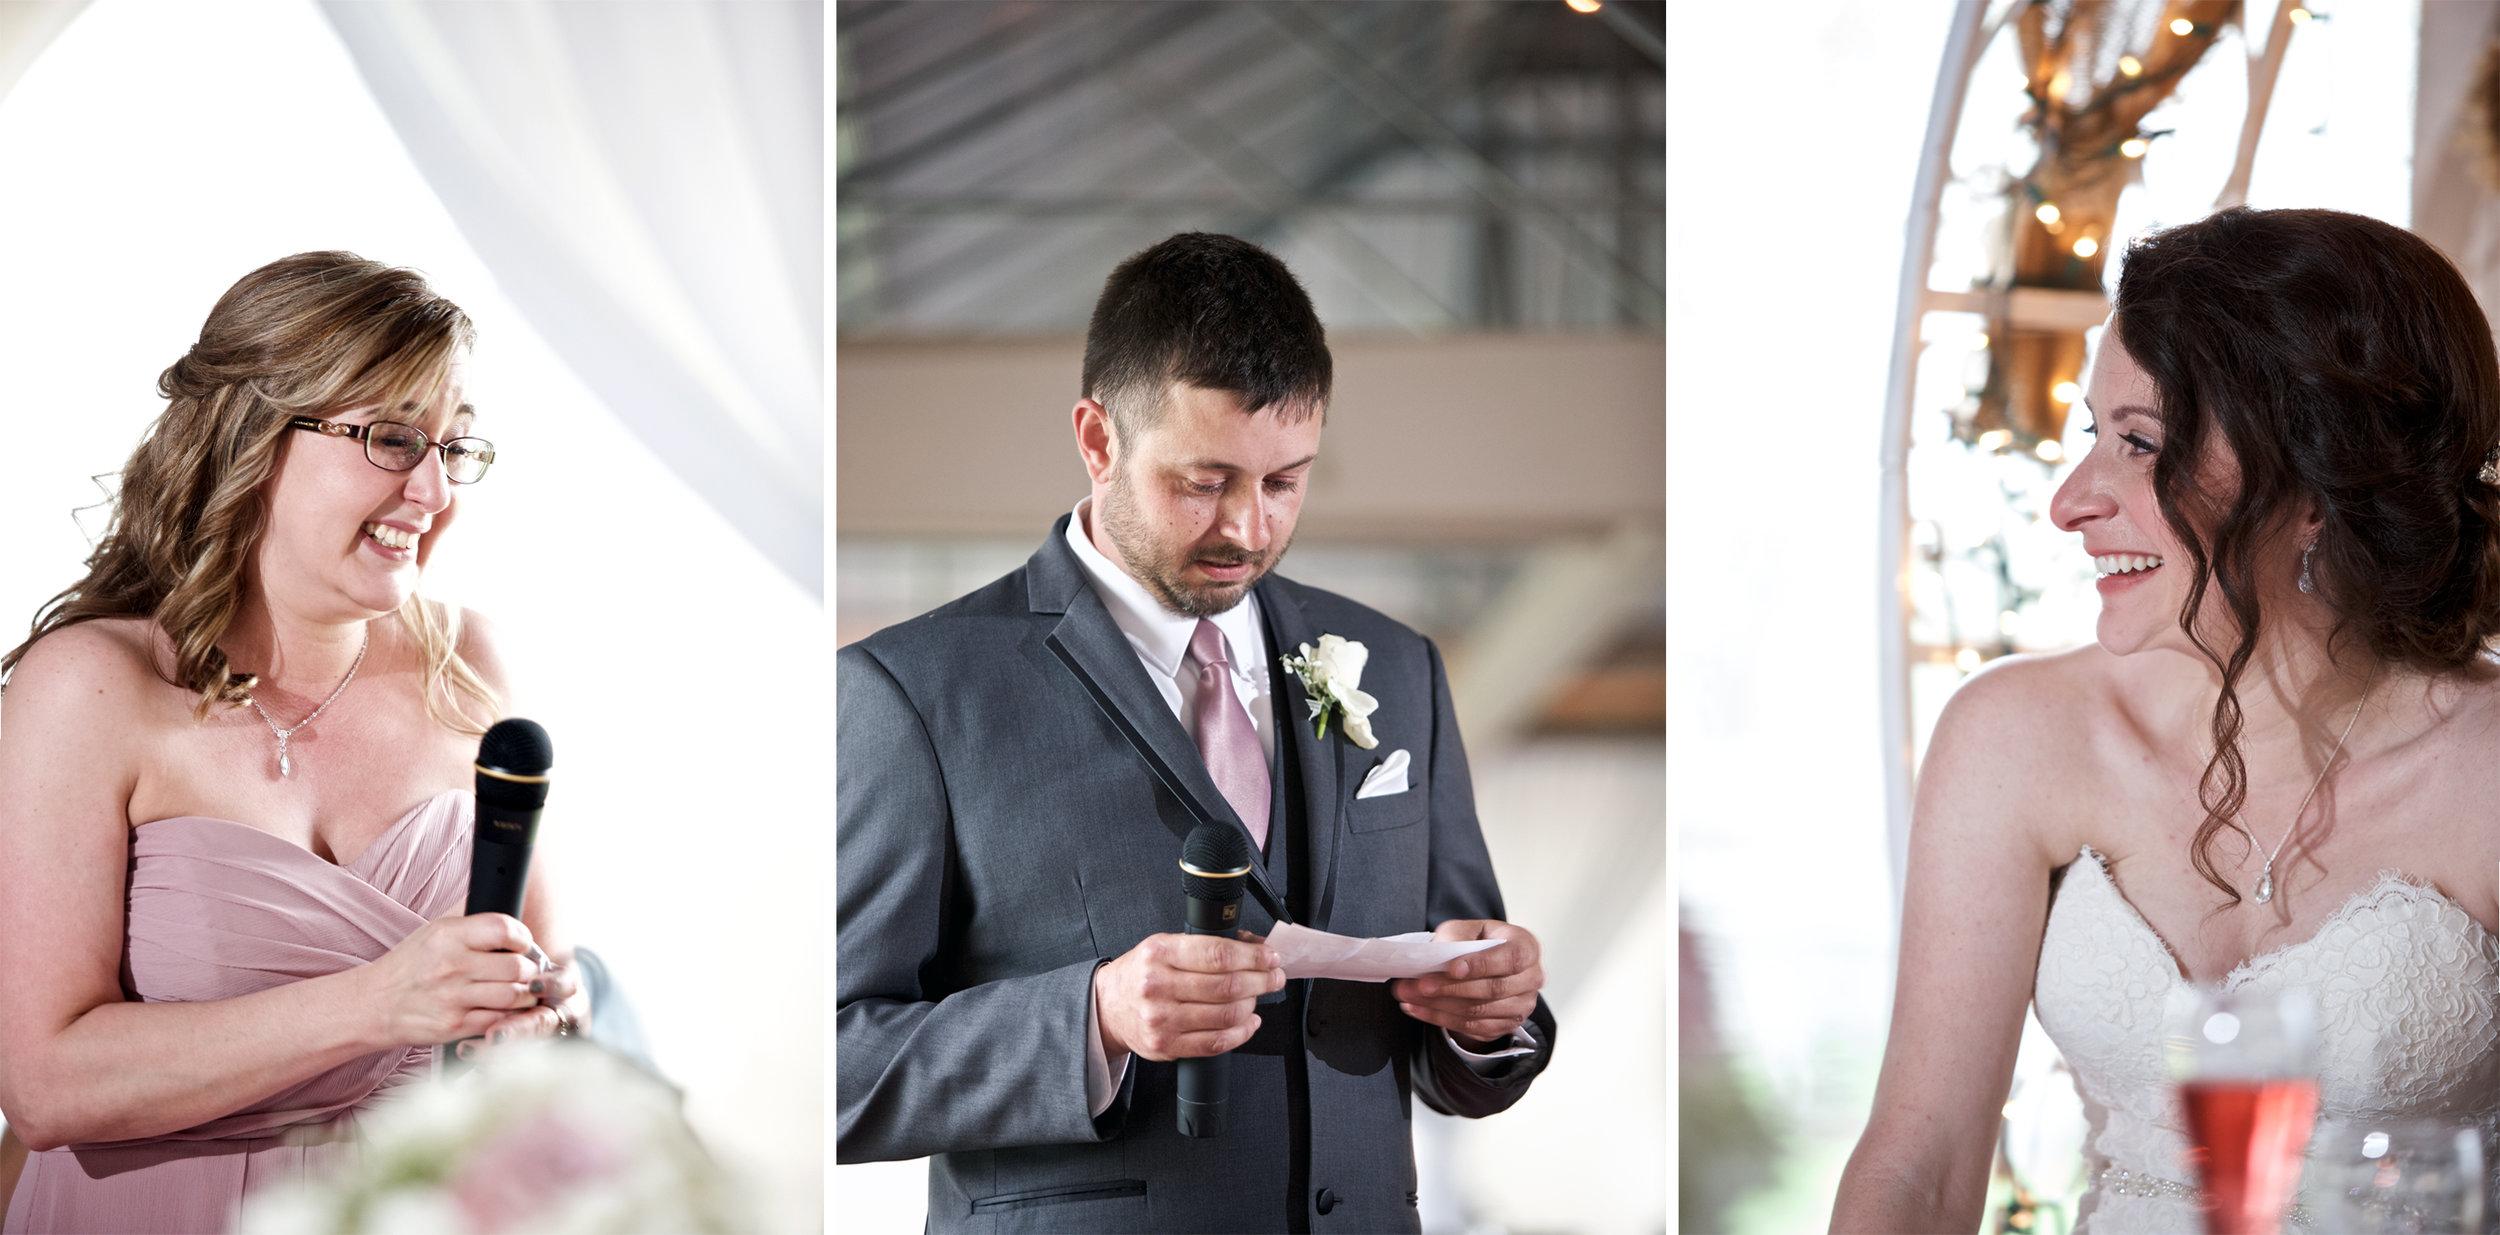 Lippincott manor wedding, wallkill ny wedding, photography, photos ad.jpg